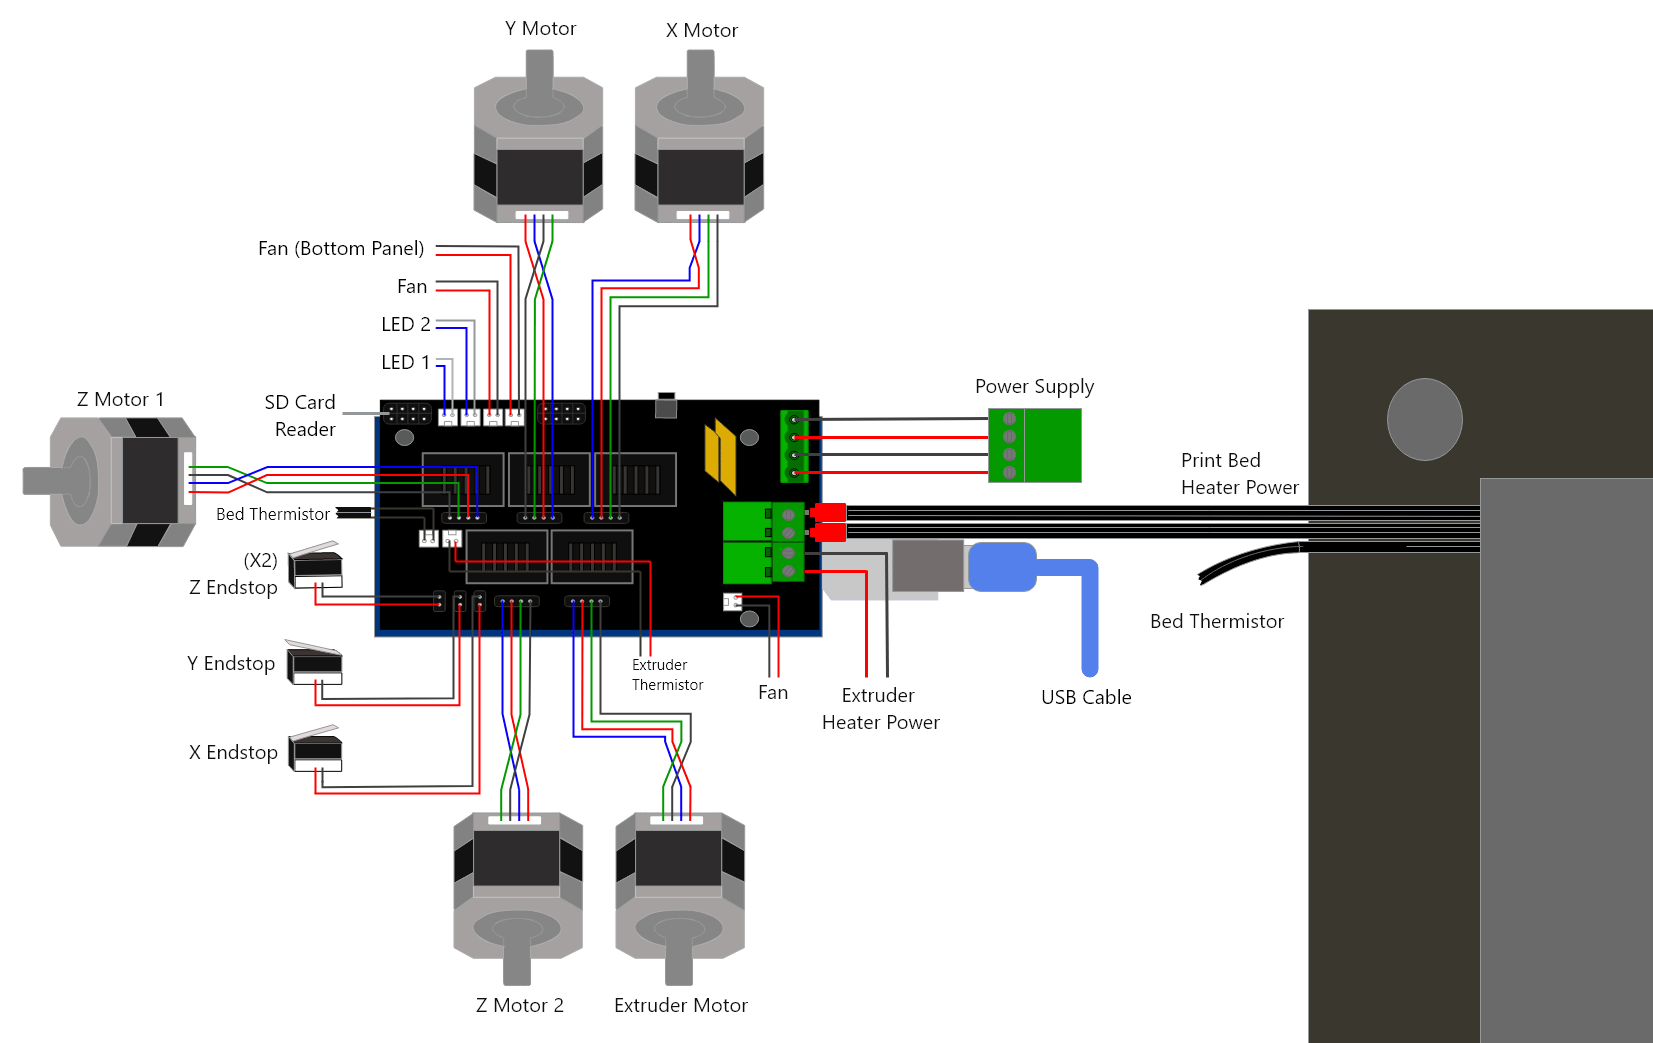 93 Fd3s Ecu Body Plug Wiring Diagram Withinecupinoutgif